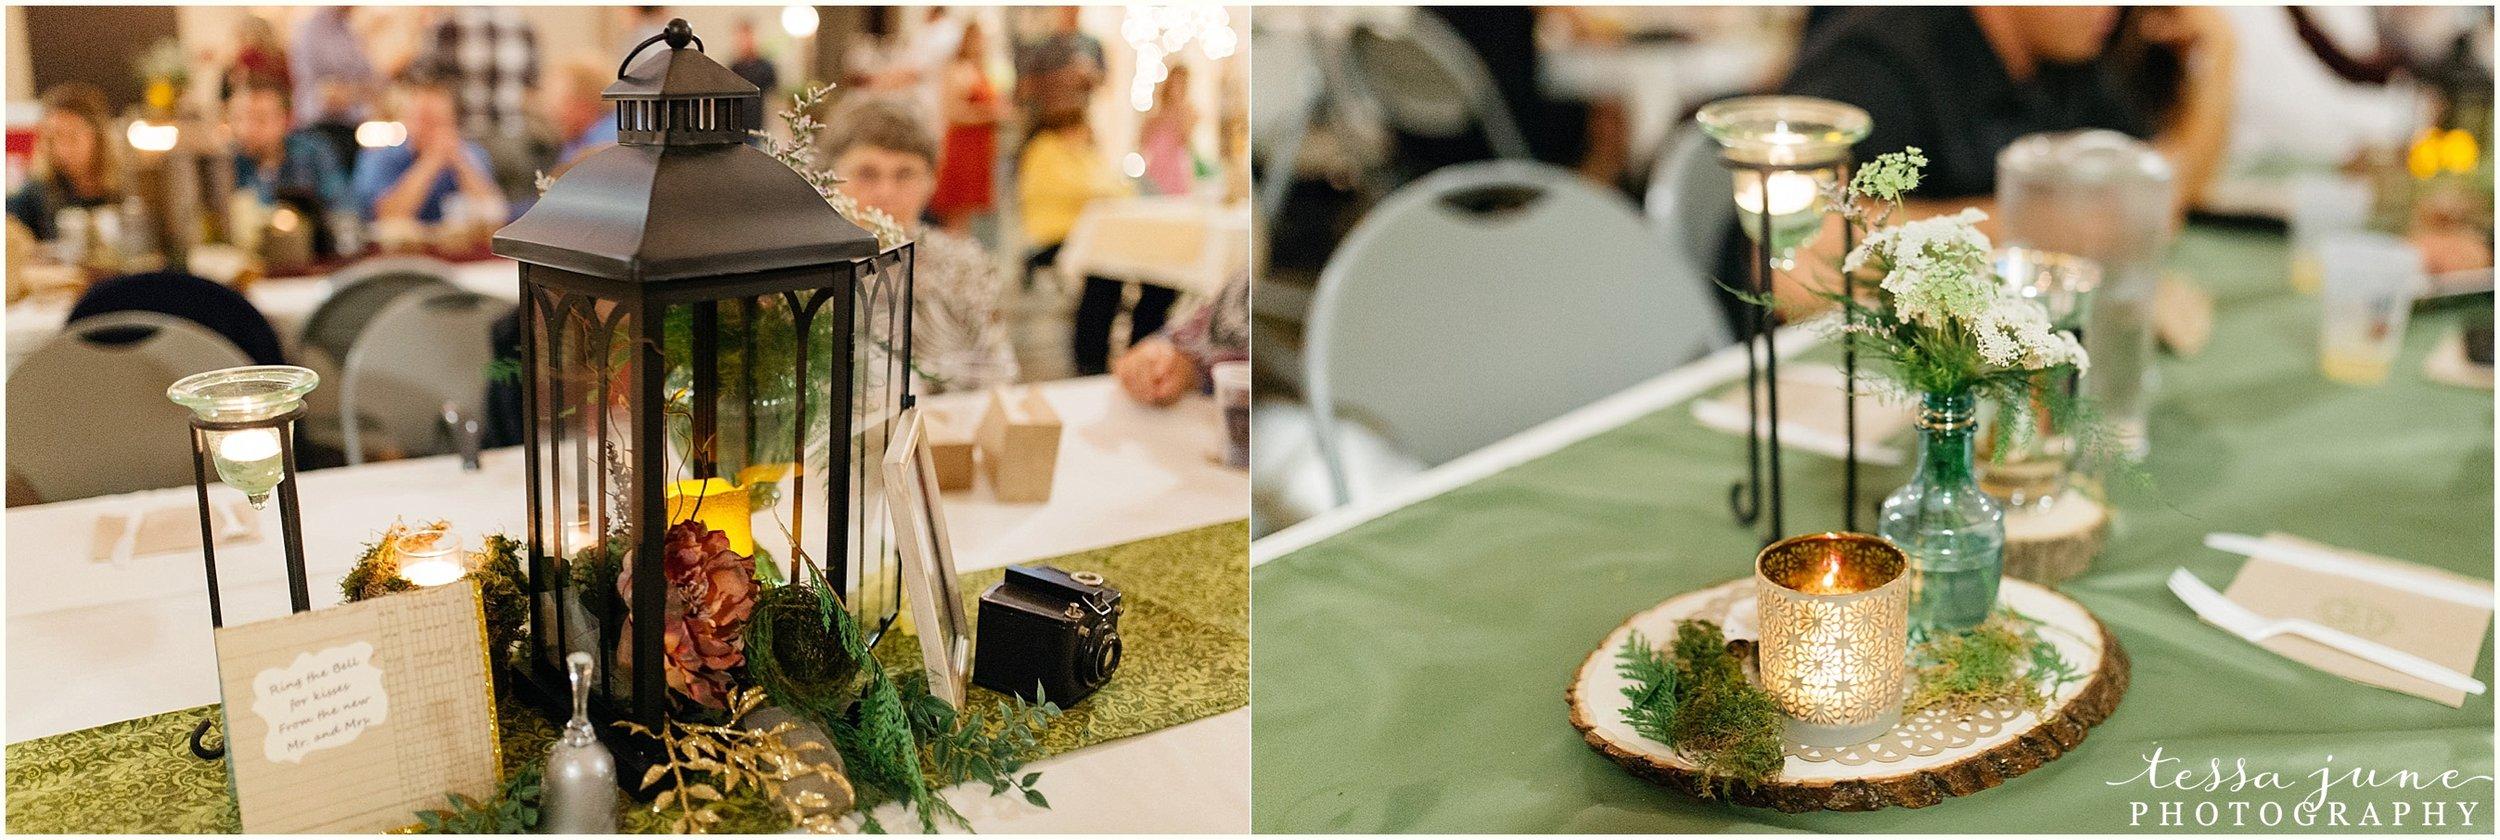 bohemian-minnesota-wedding-mismatched-bridesmaid-dresses-waterfall-st-cloud-tessa-june-photography-139.jpg